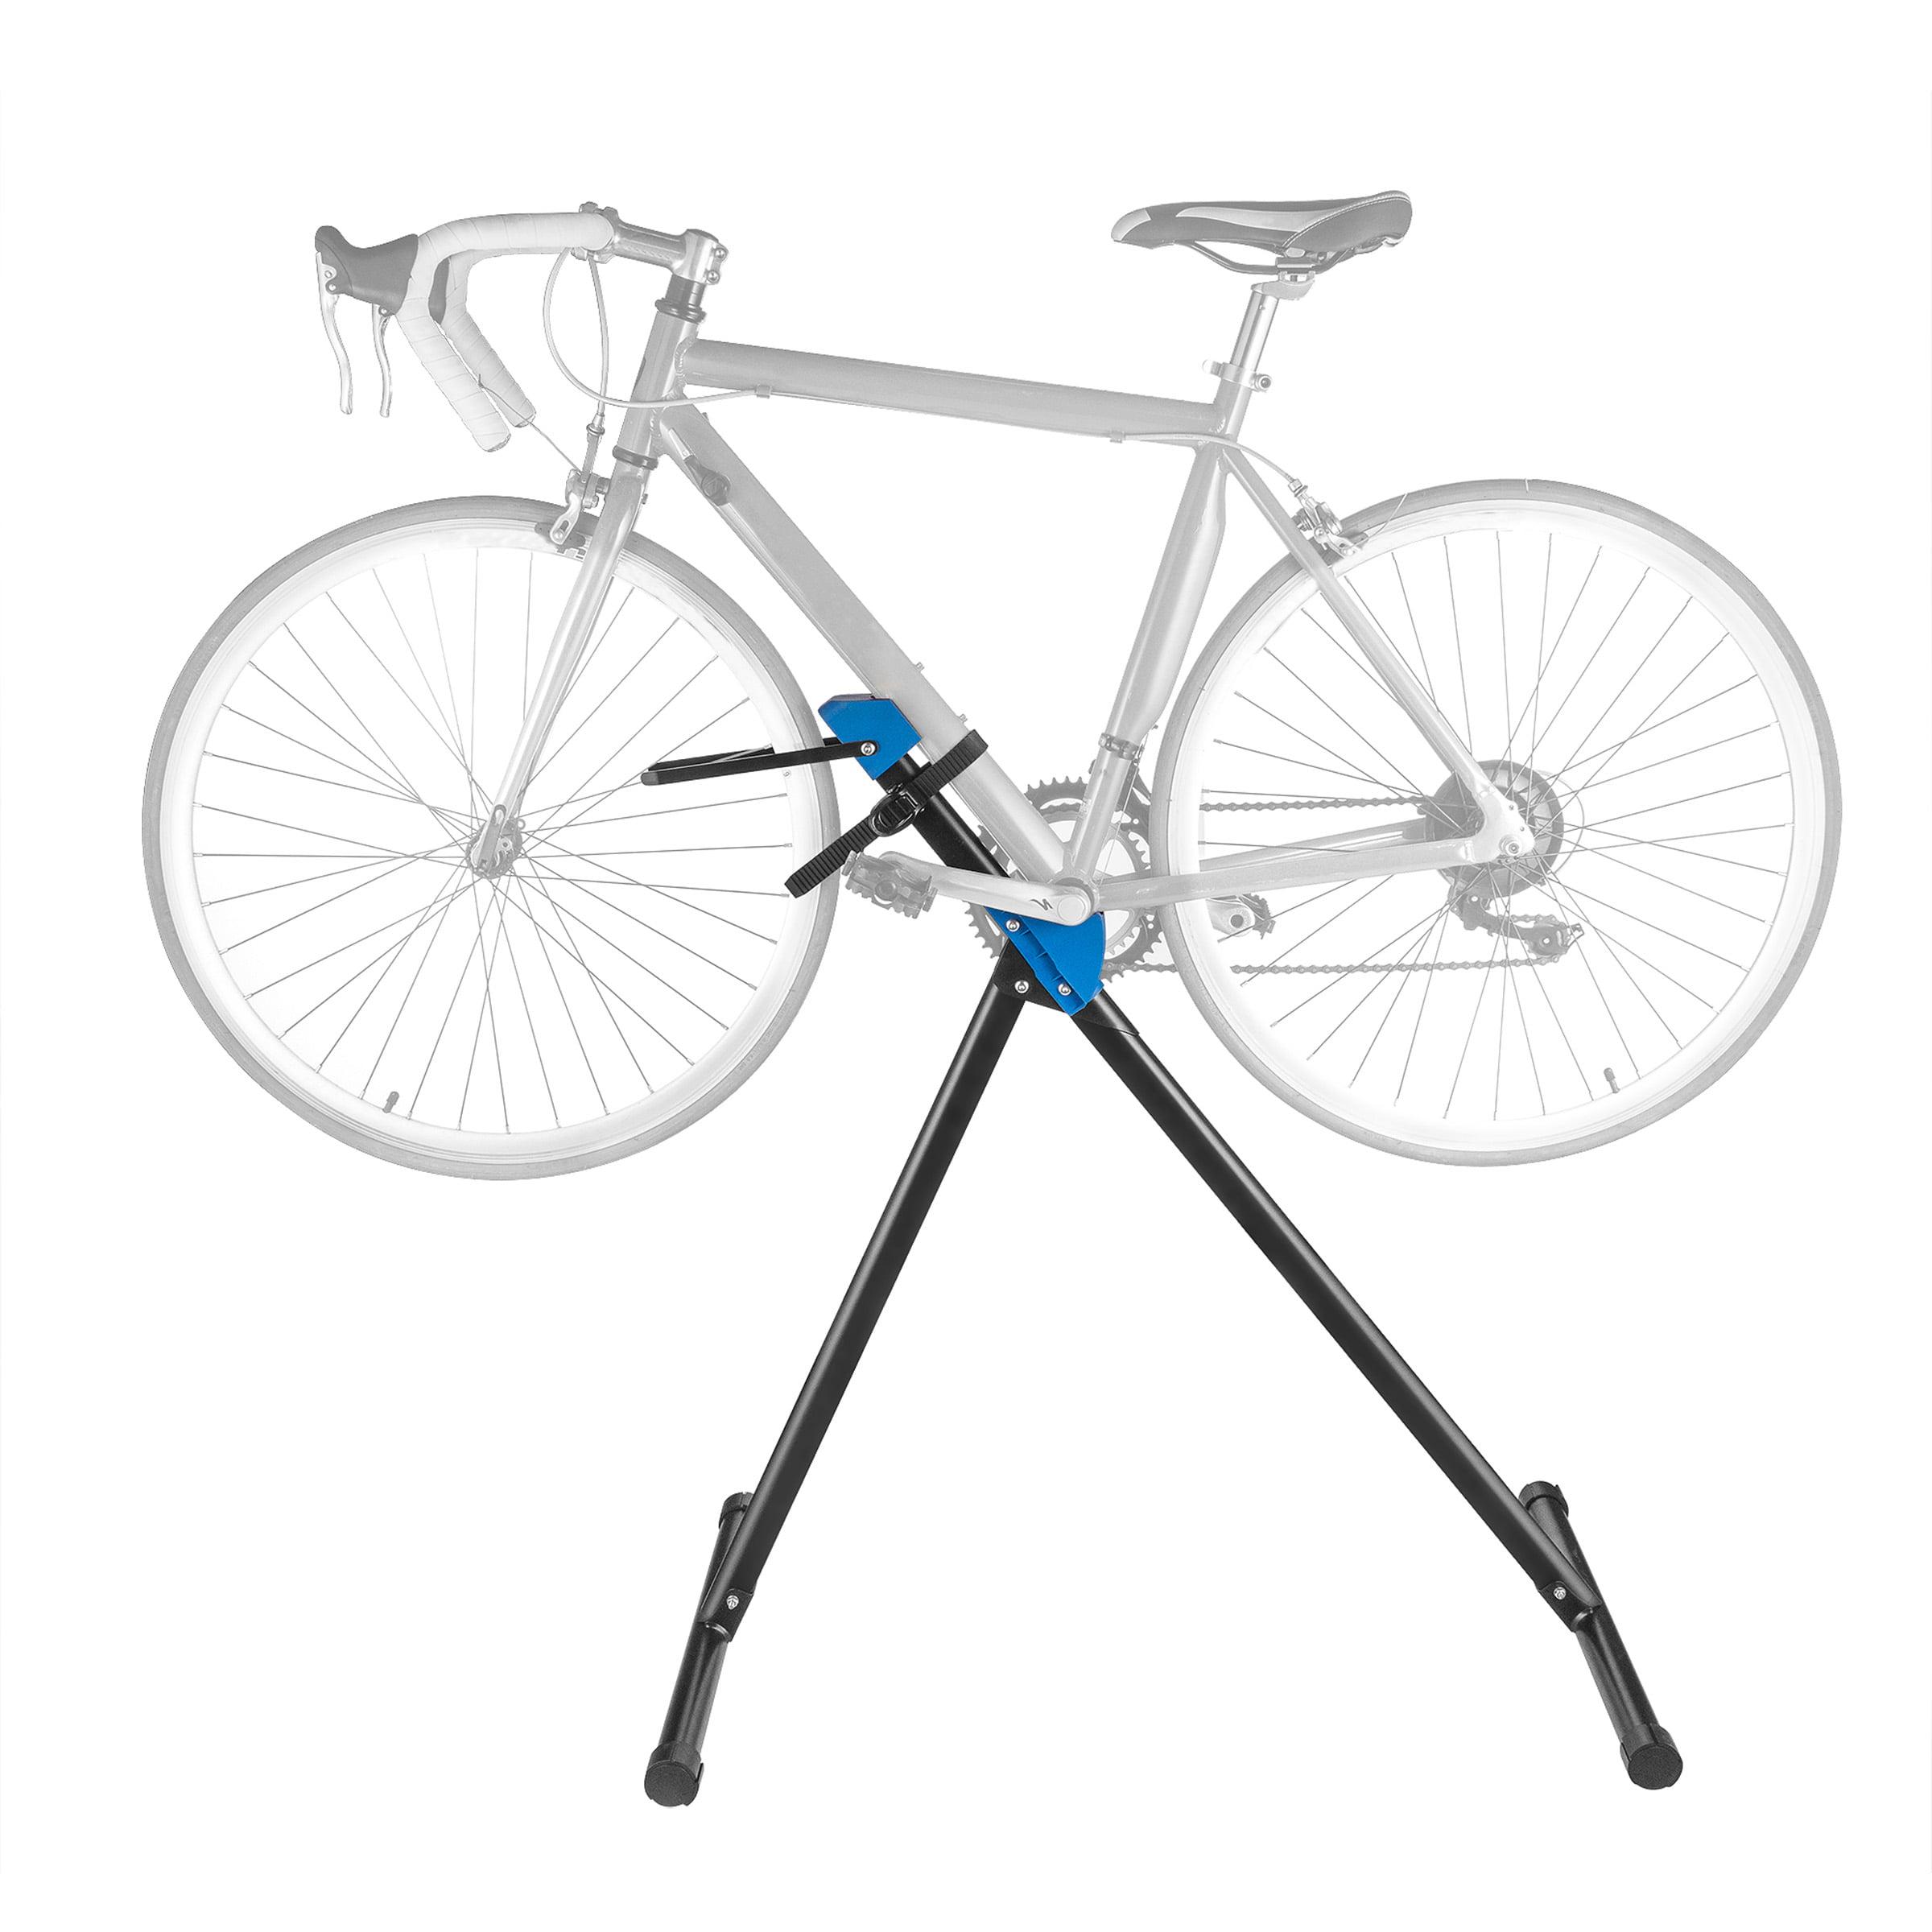 RAD Cycle Fold-N-Go Bicycle Repair Stand Bike Work Like a Pro Mechanic at Home